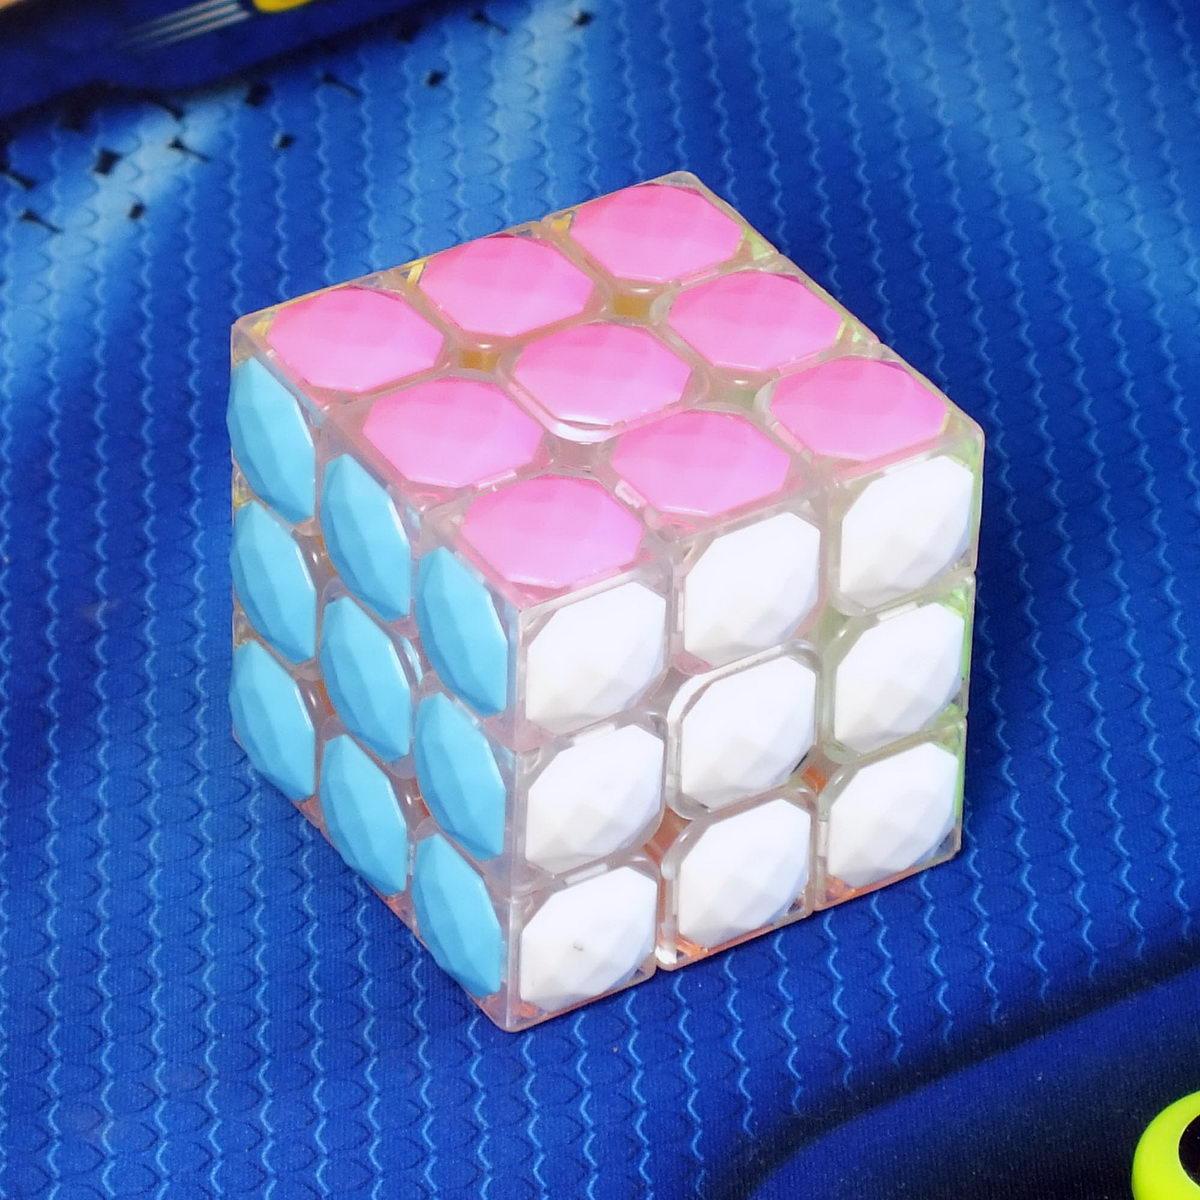 Moyu Diamond Сube 3x3 transparent white